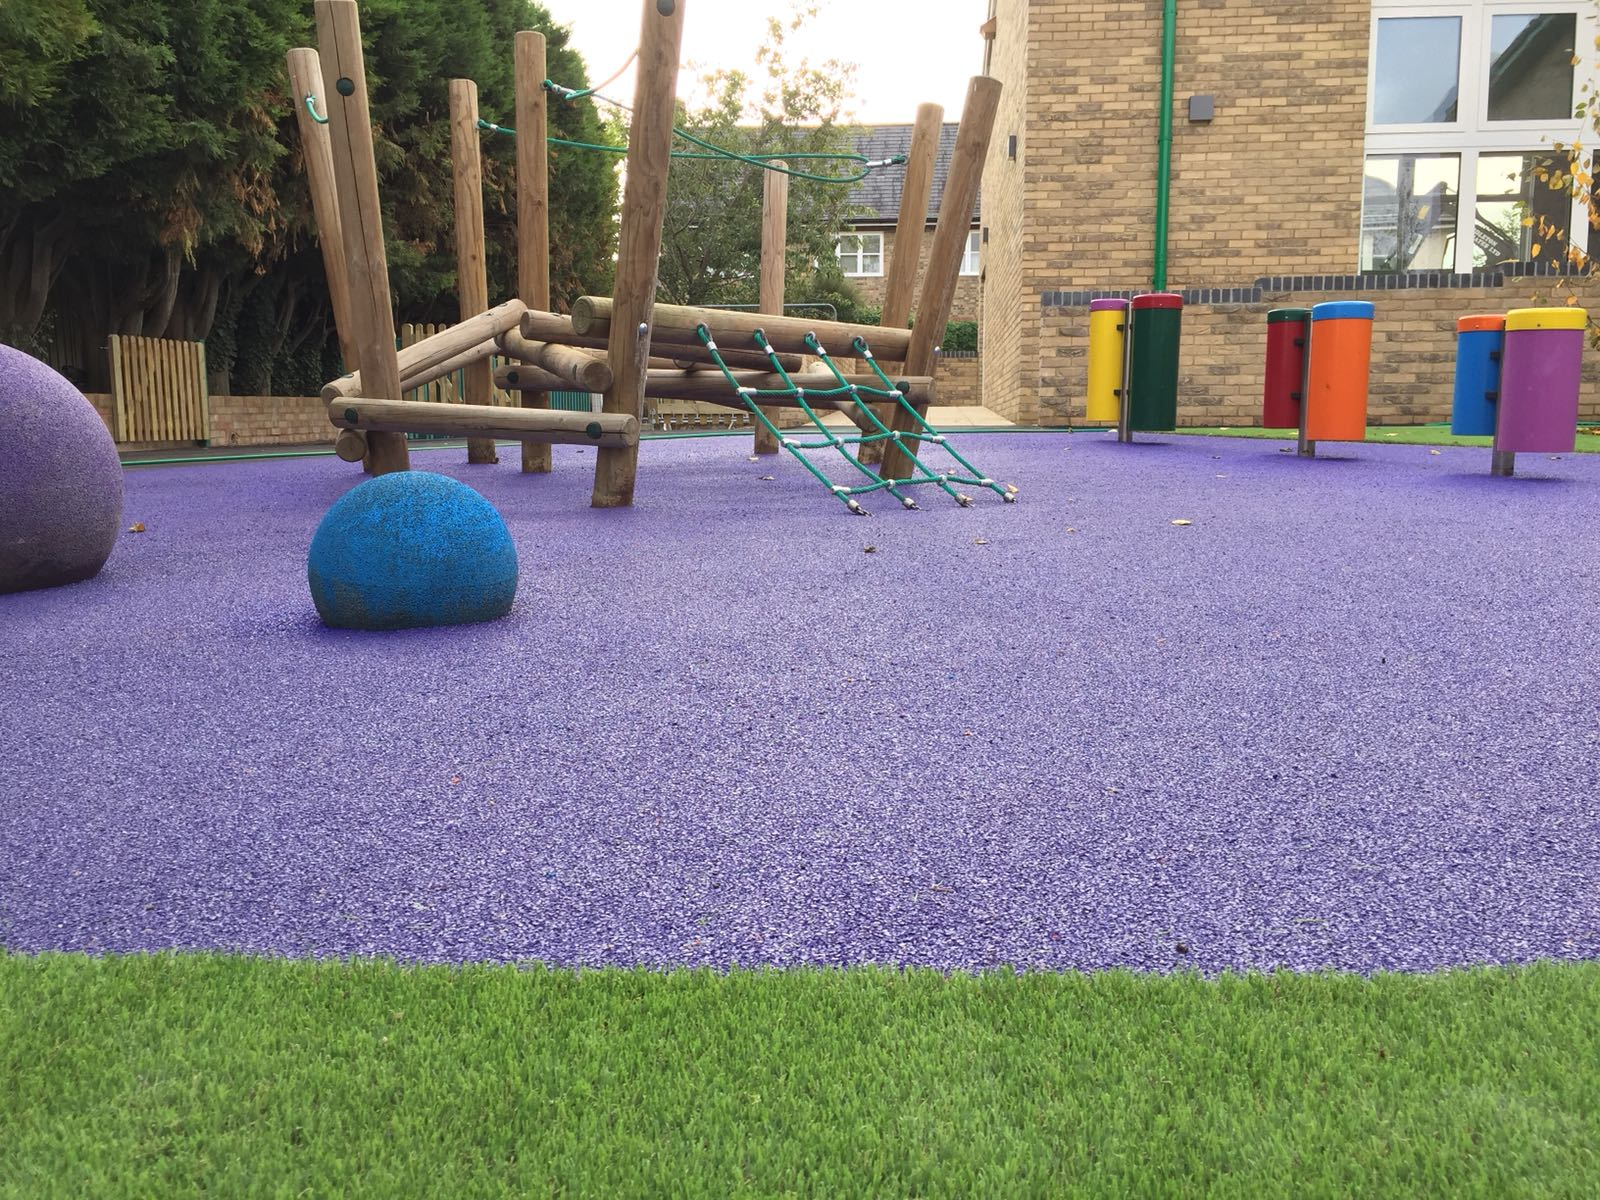 Wetpour & Artificial Grass in Fulbourn, Cambridge